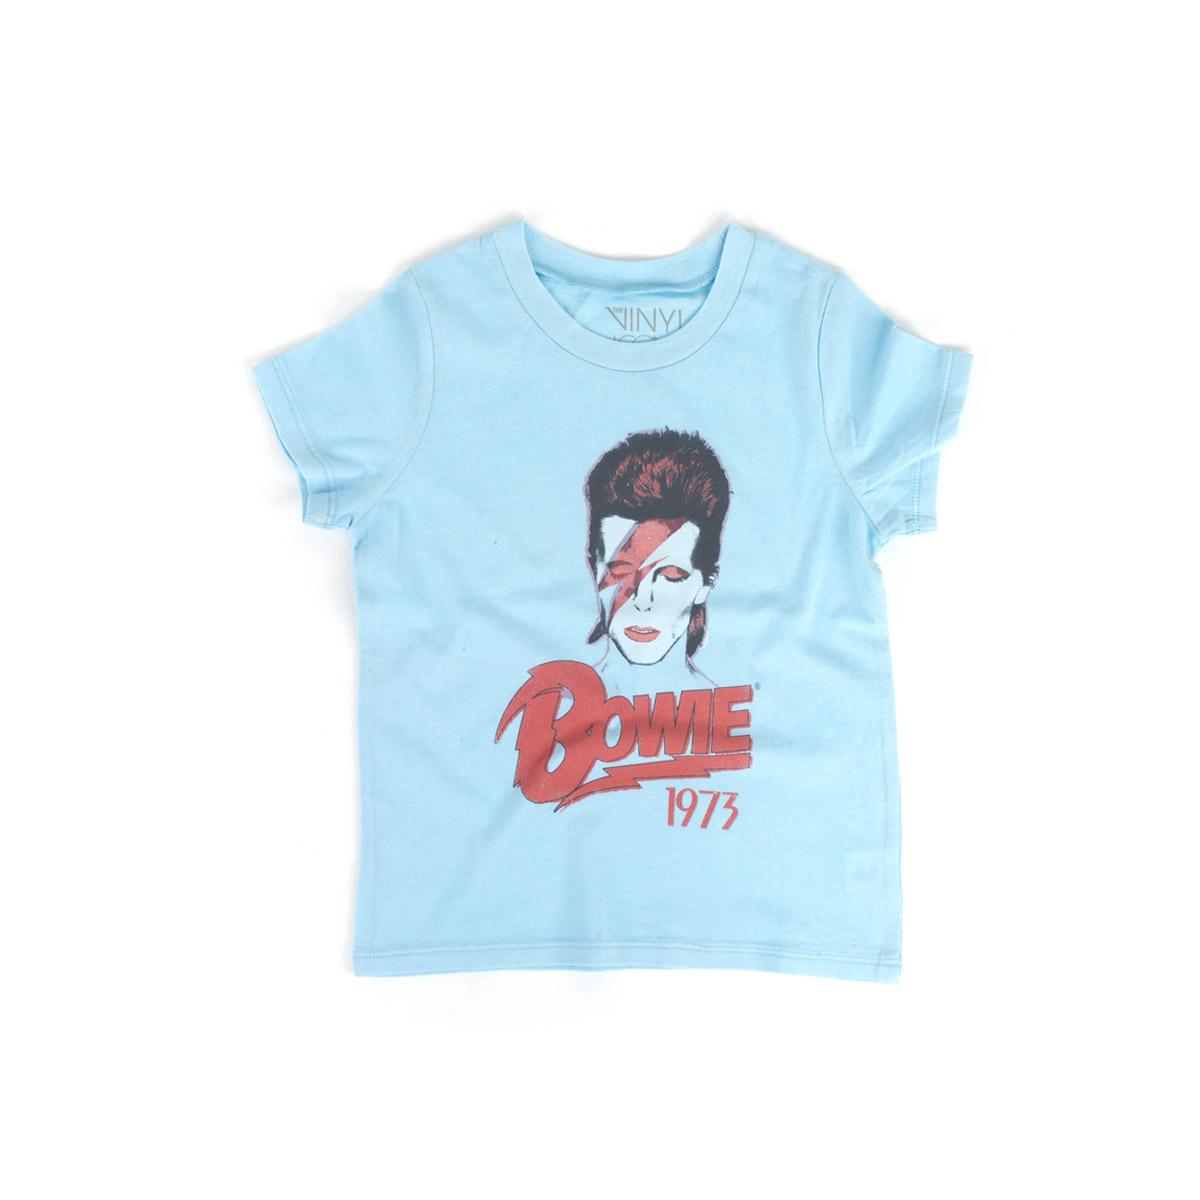 1973 Aladdin Sane Kids T-shirt